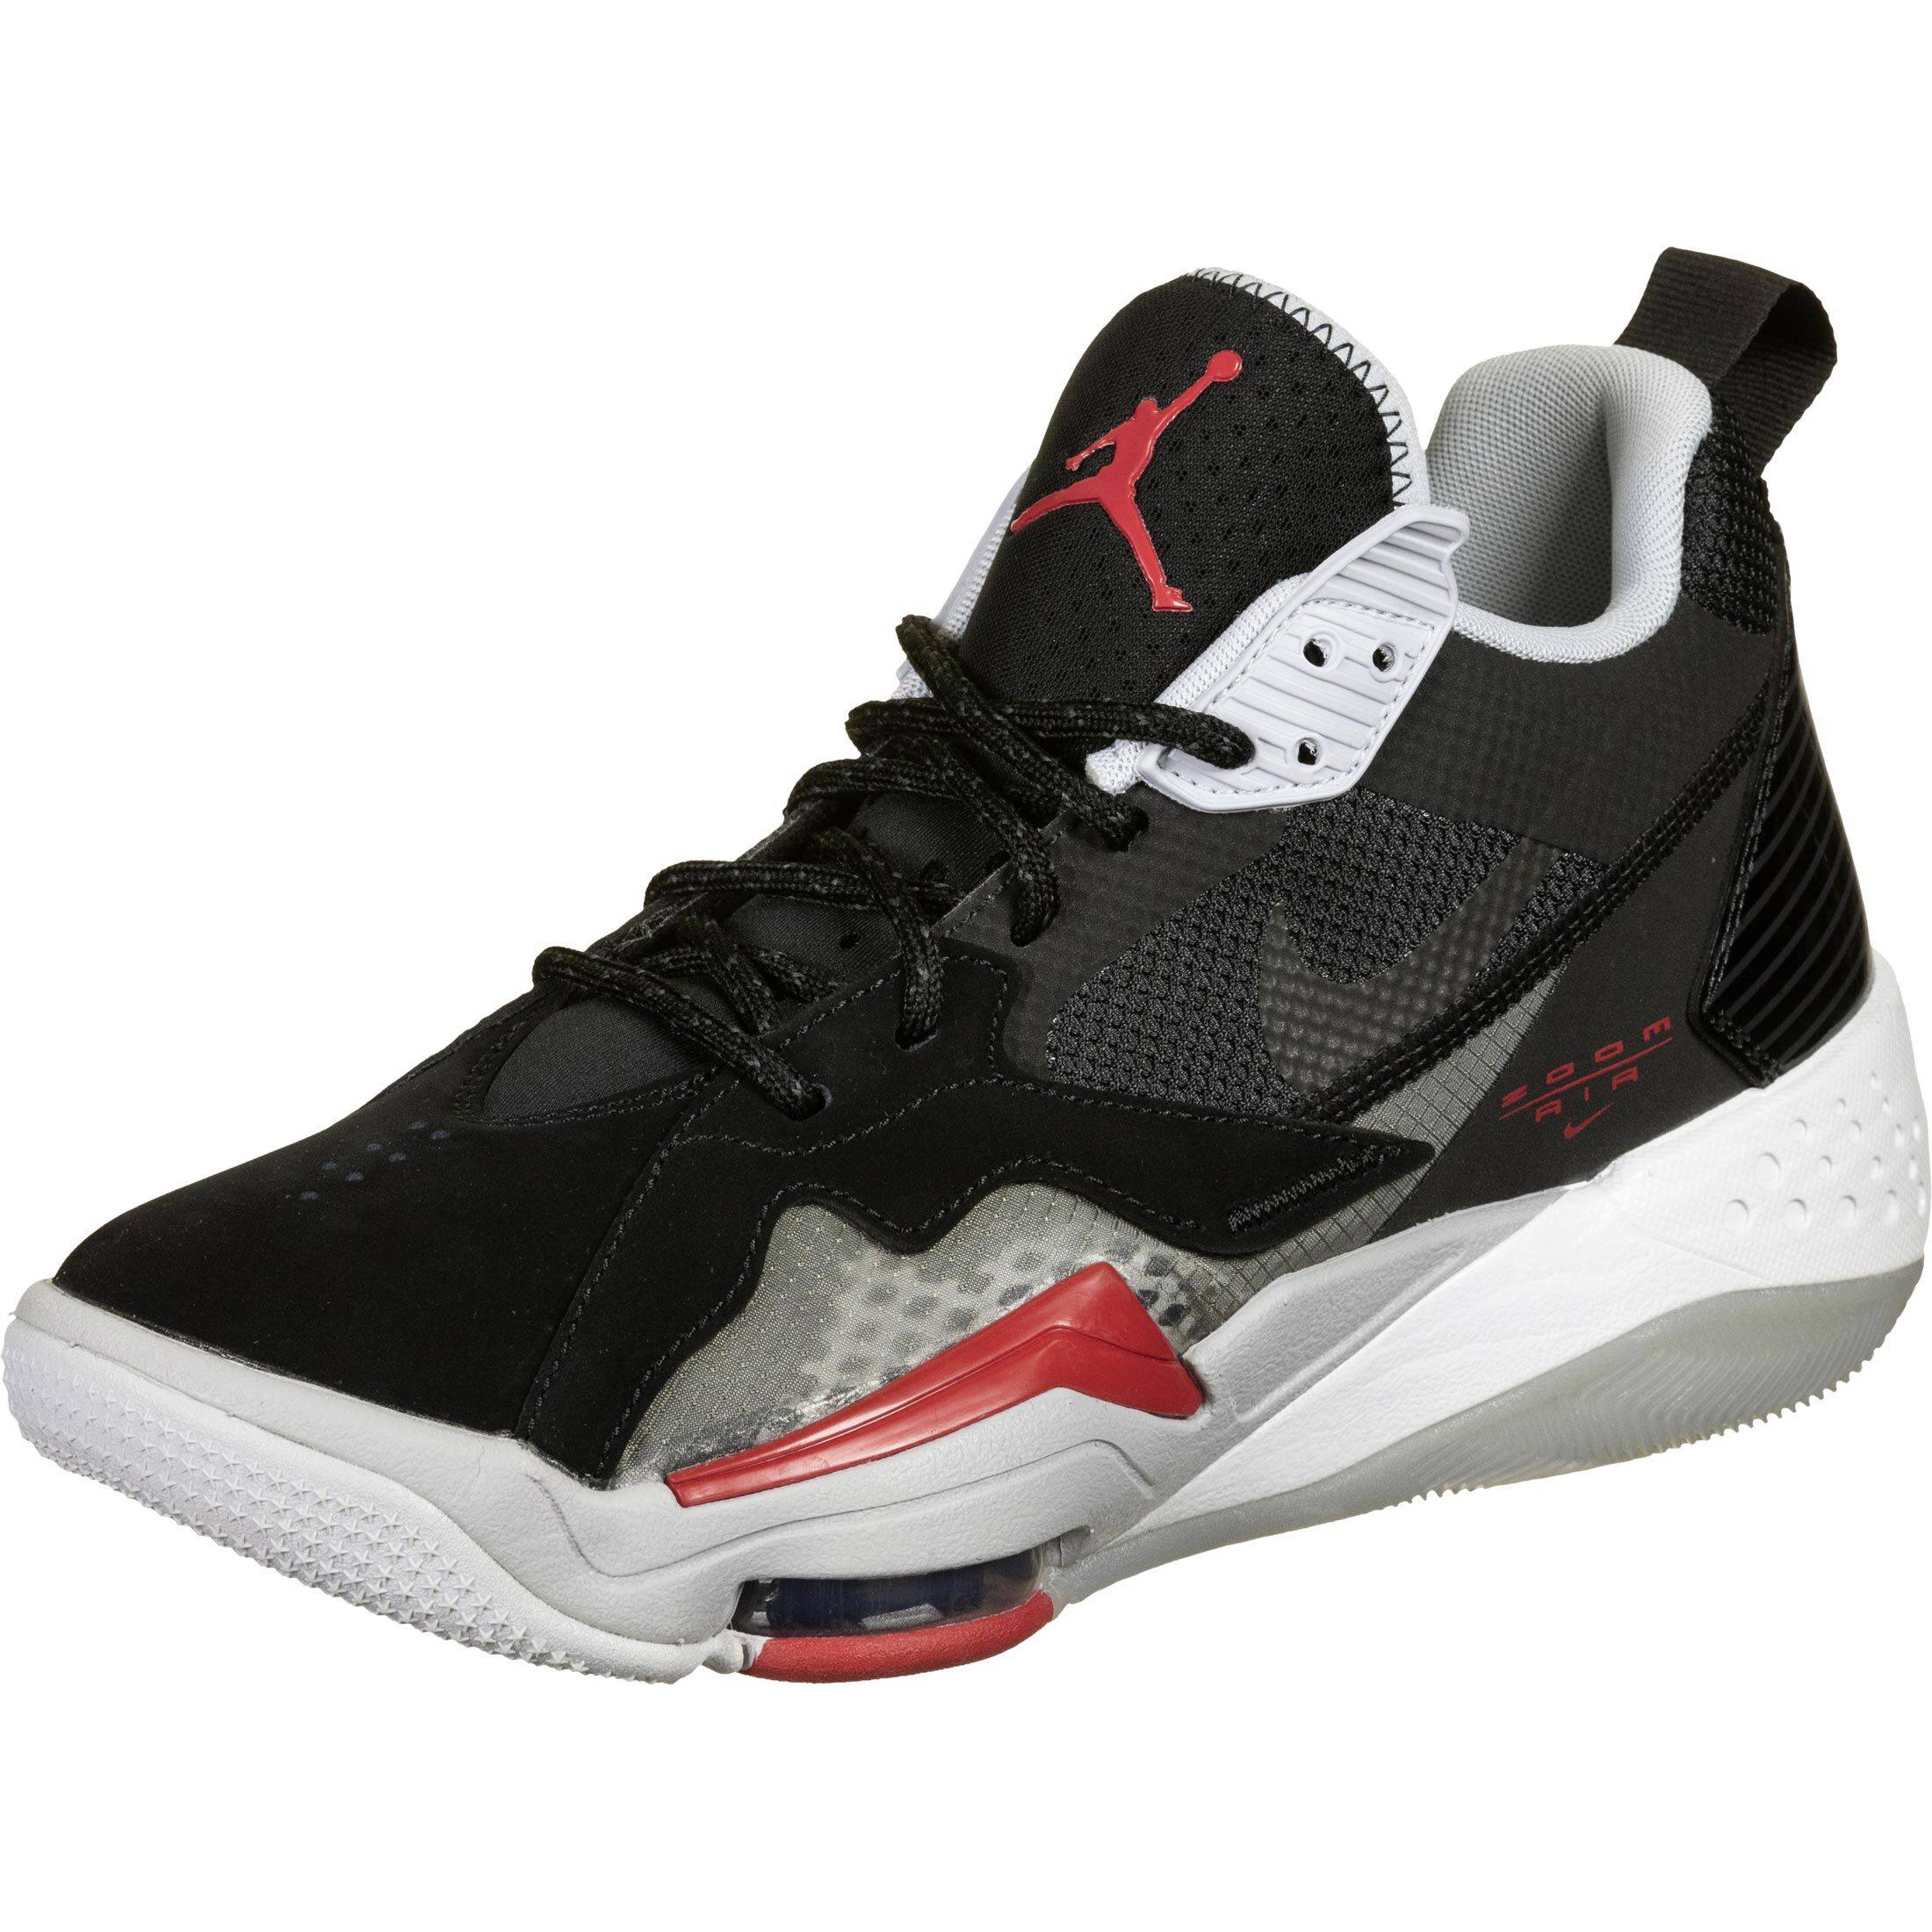 Jordan Zoom 92, 40 EU, homme, black/red/anthracite/sky grey